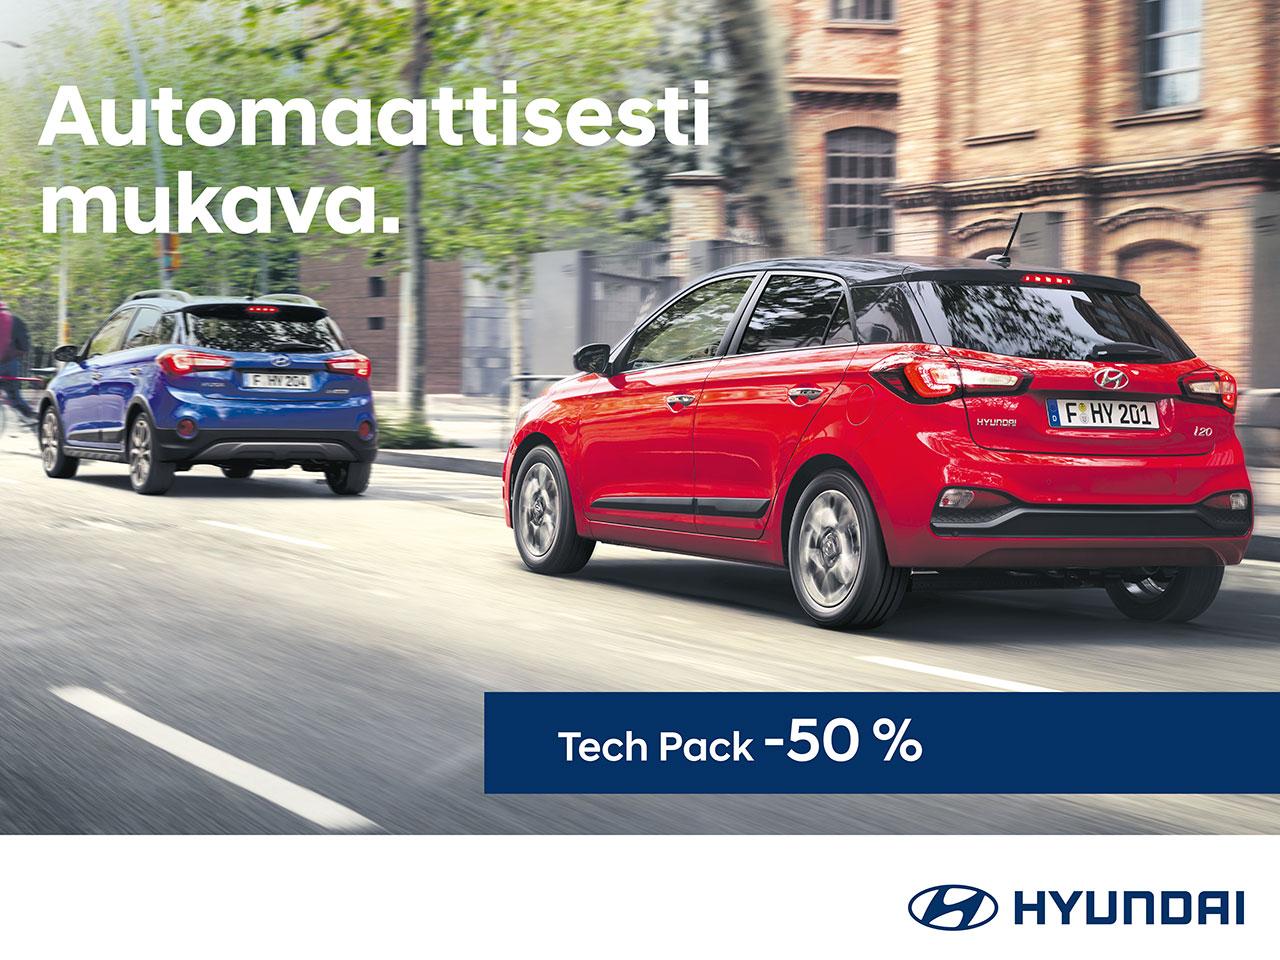 Hyundai i20: Tech Pack puoleen hintaan